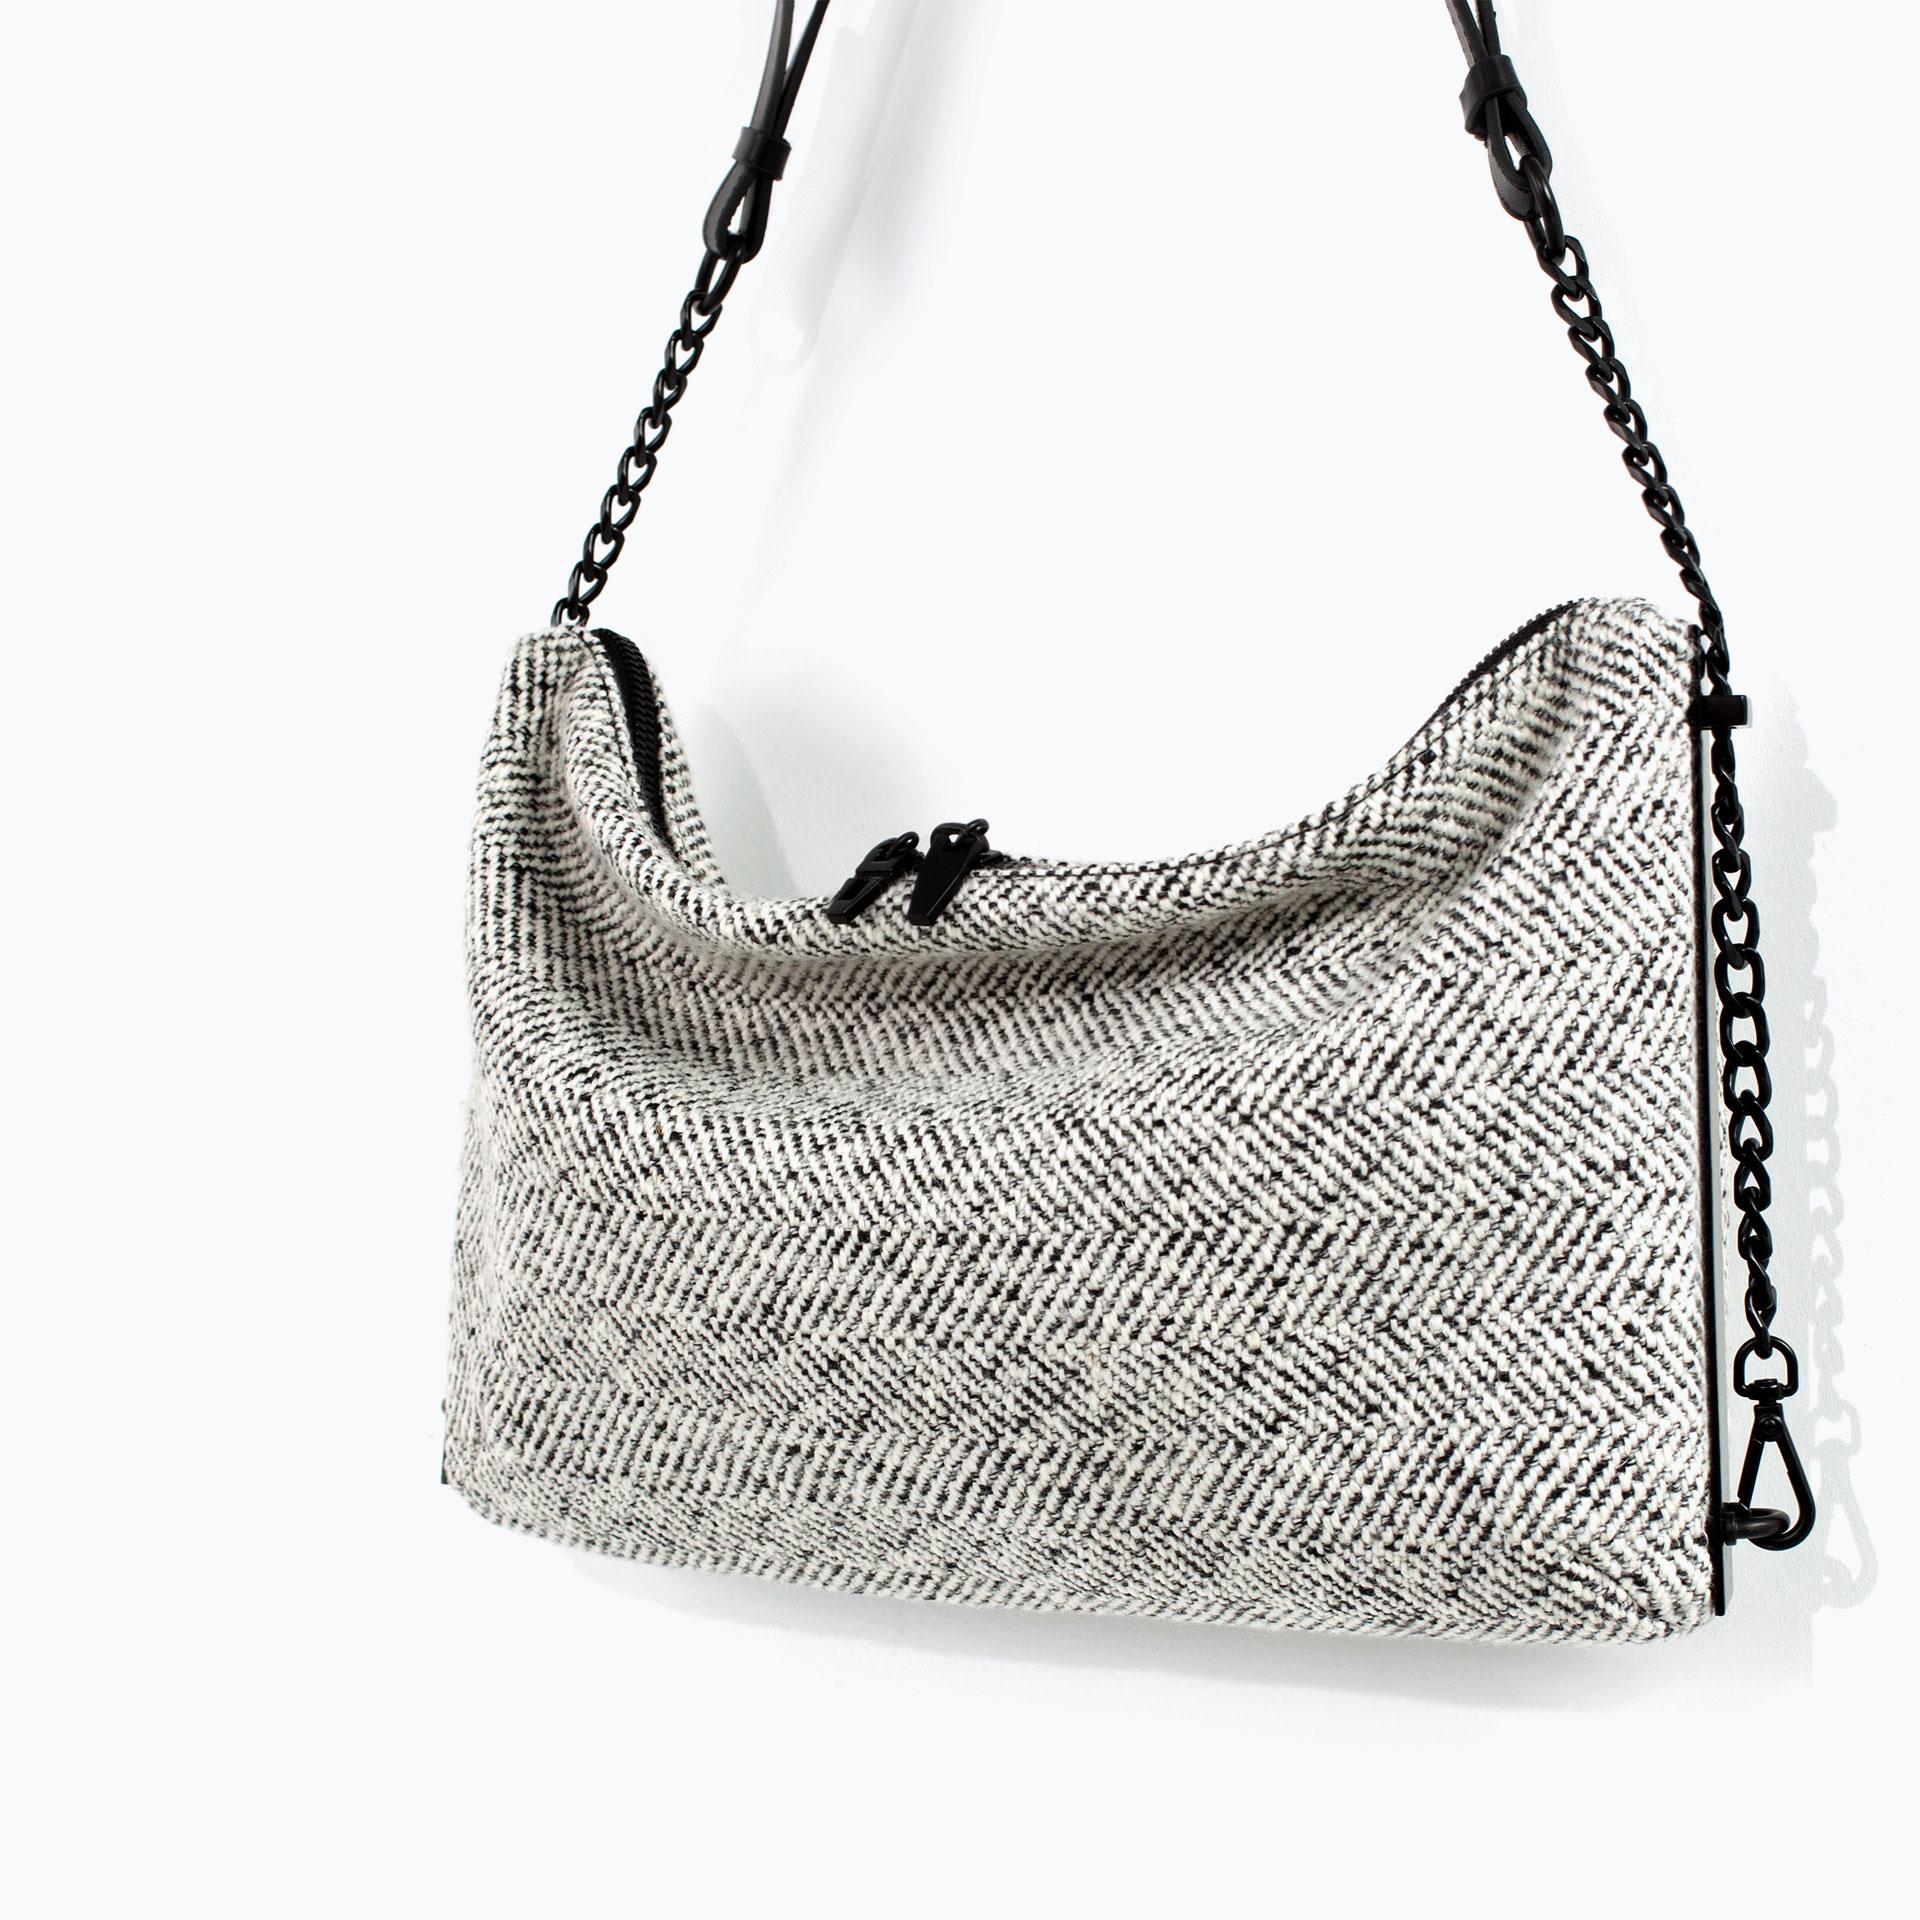 Zara Fabric Messenger Bag In Gray Multicolour Lyst